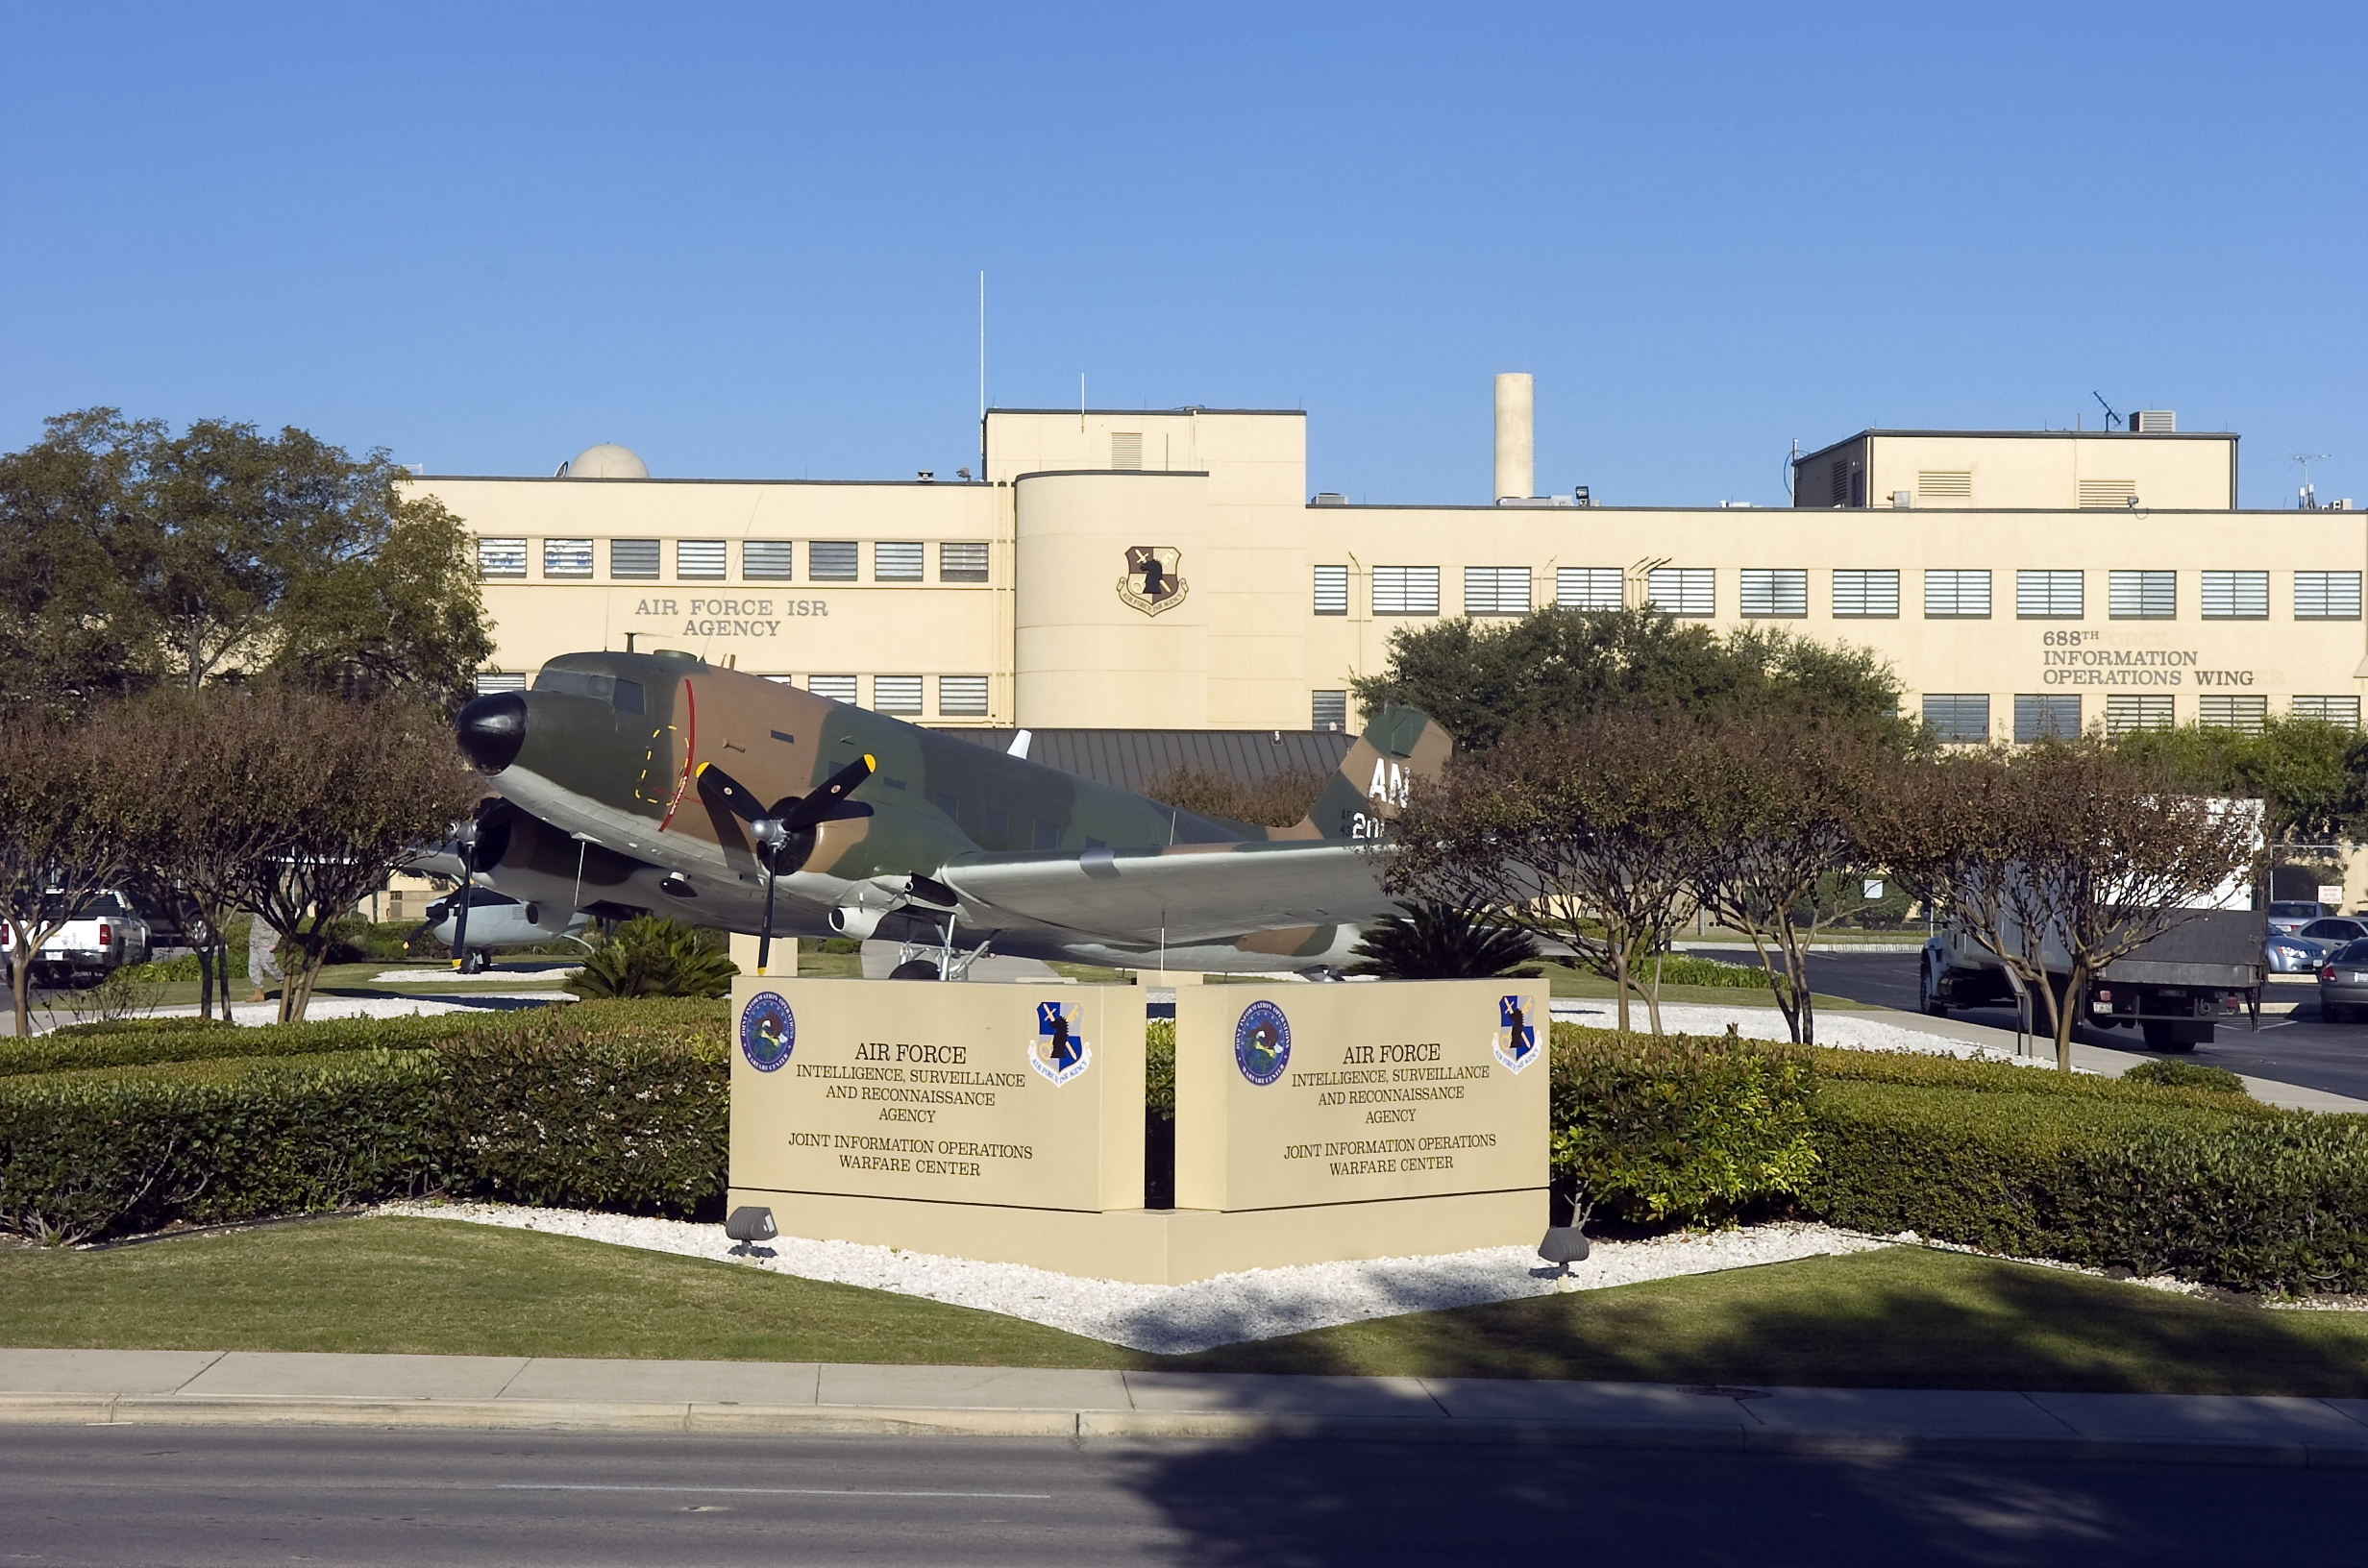 Civilian furloughs at air force isr agency may affect for San antonio home alarm